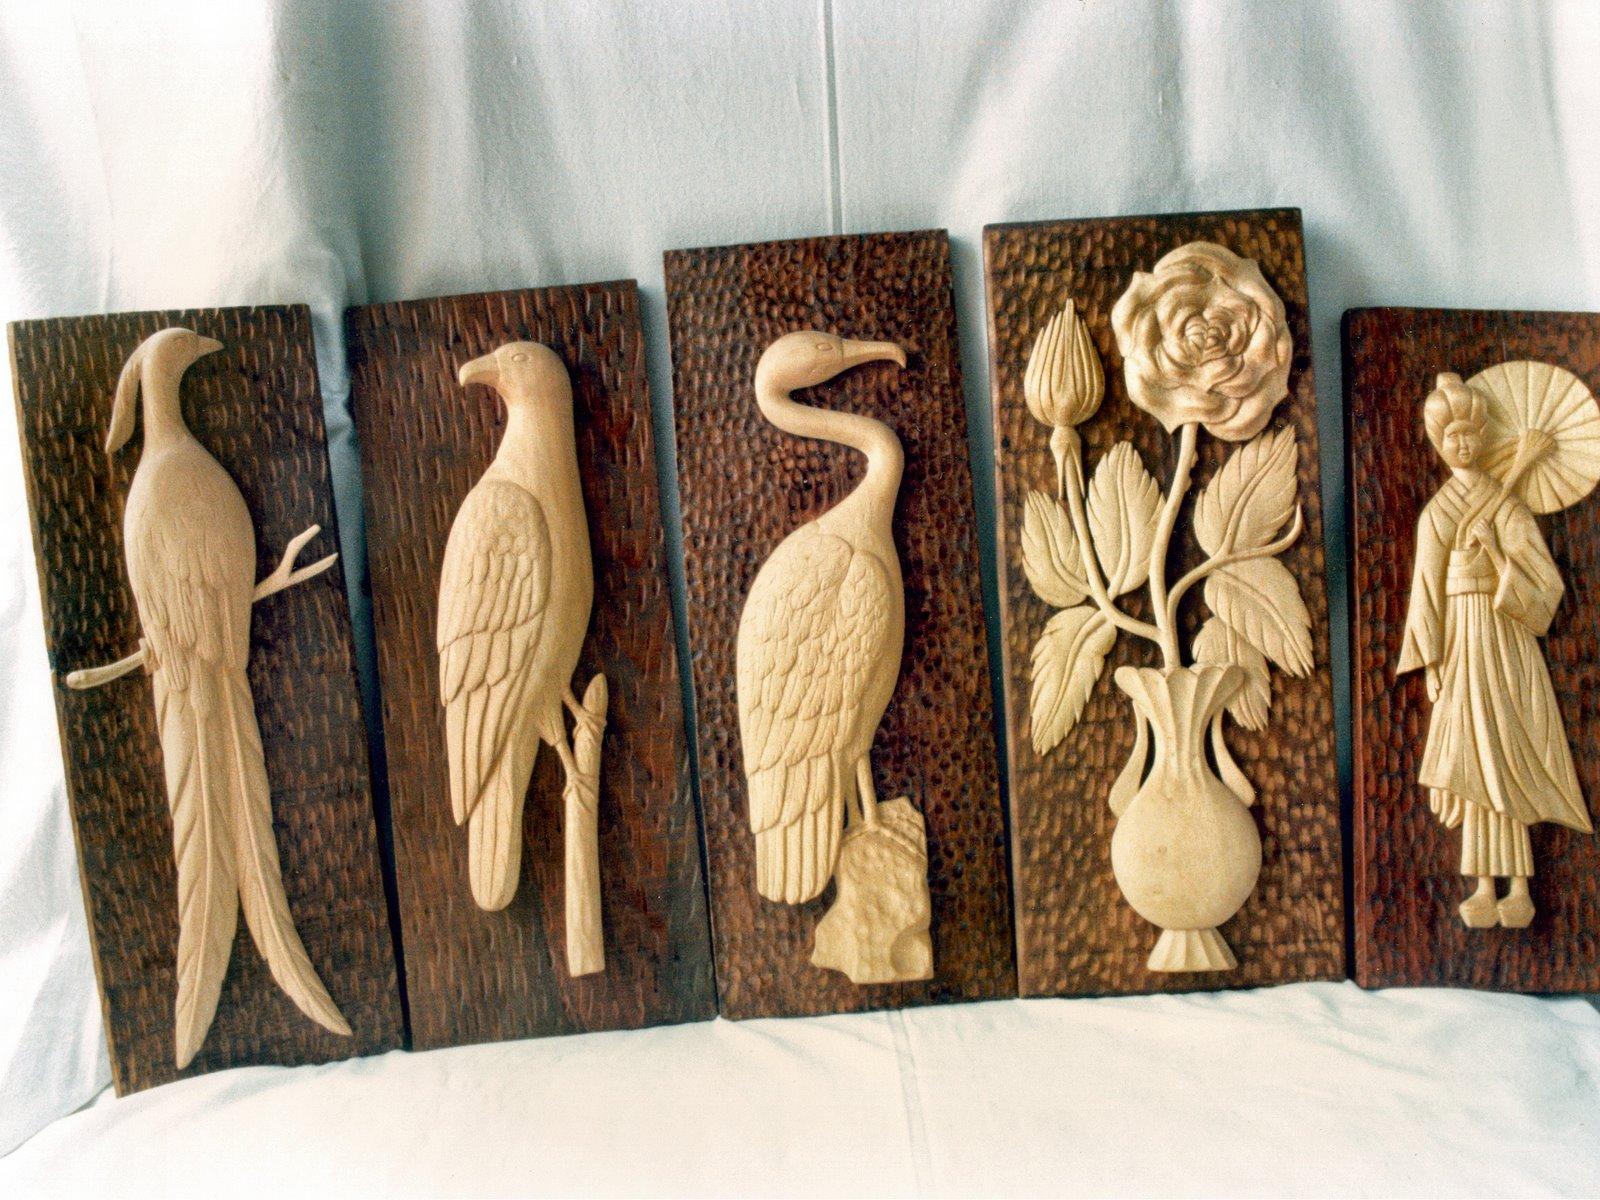 Jarr n con flores talla en madera wood carving esculturas - Fotos en madera ...